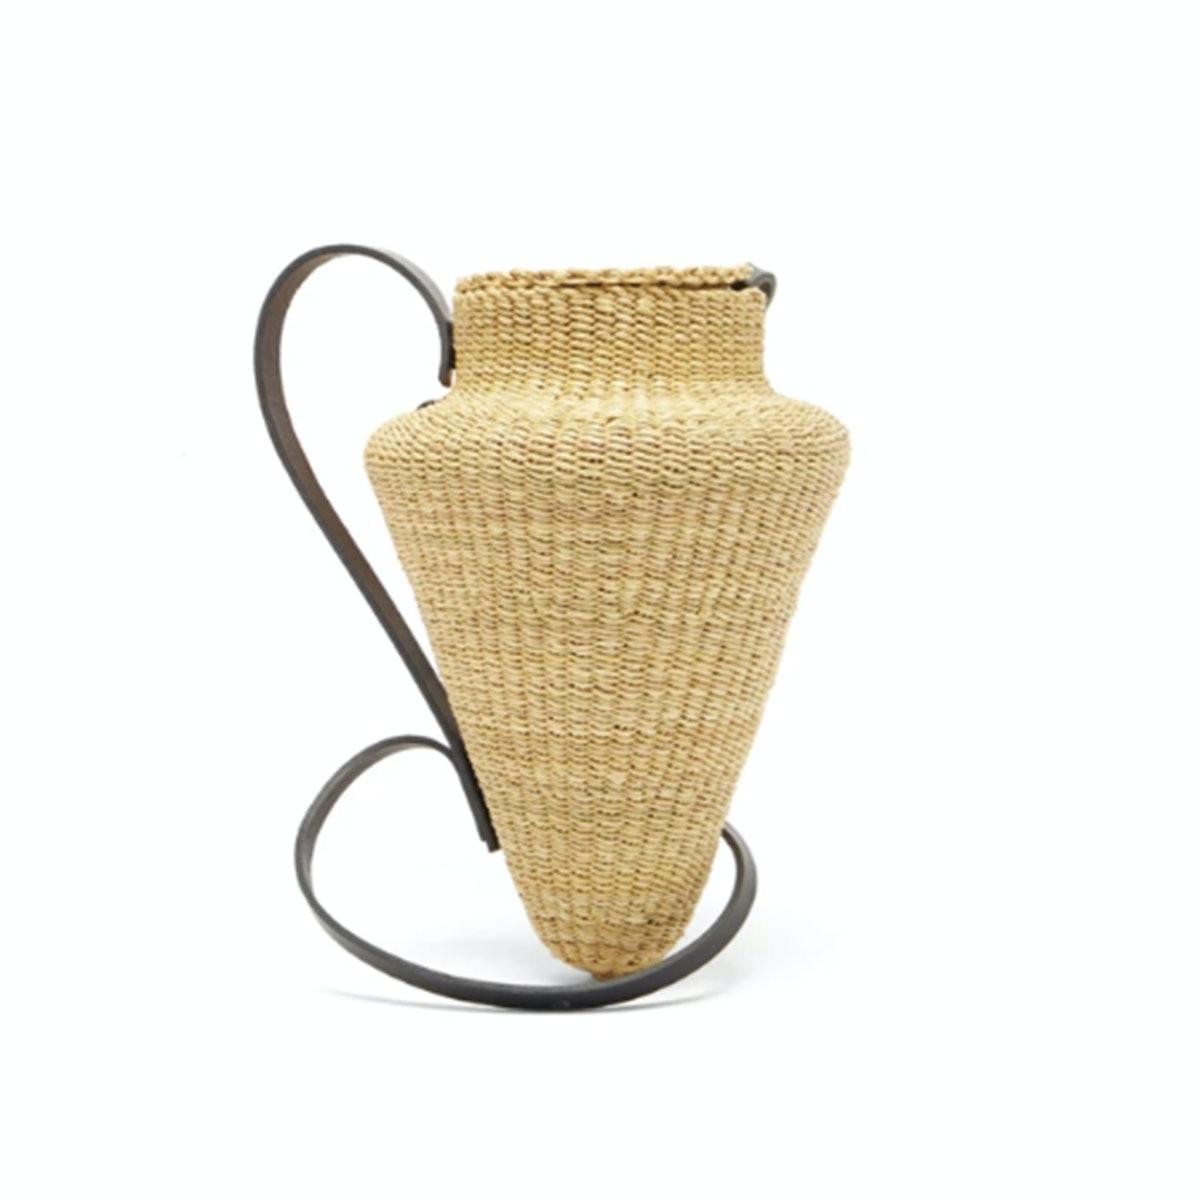 Ines Bressand N.17 Grande Amphore Straw Basket Bag